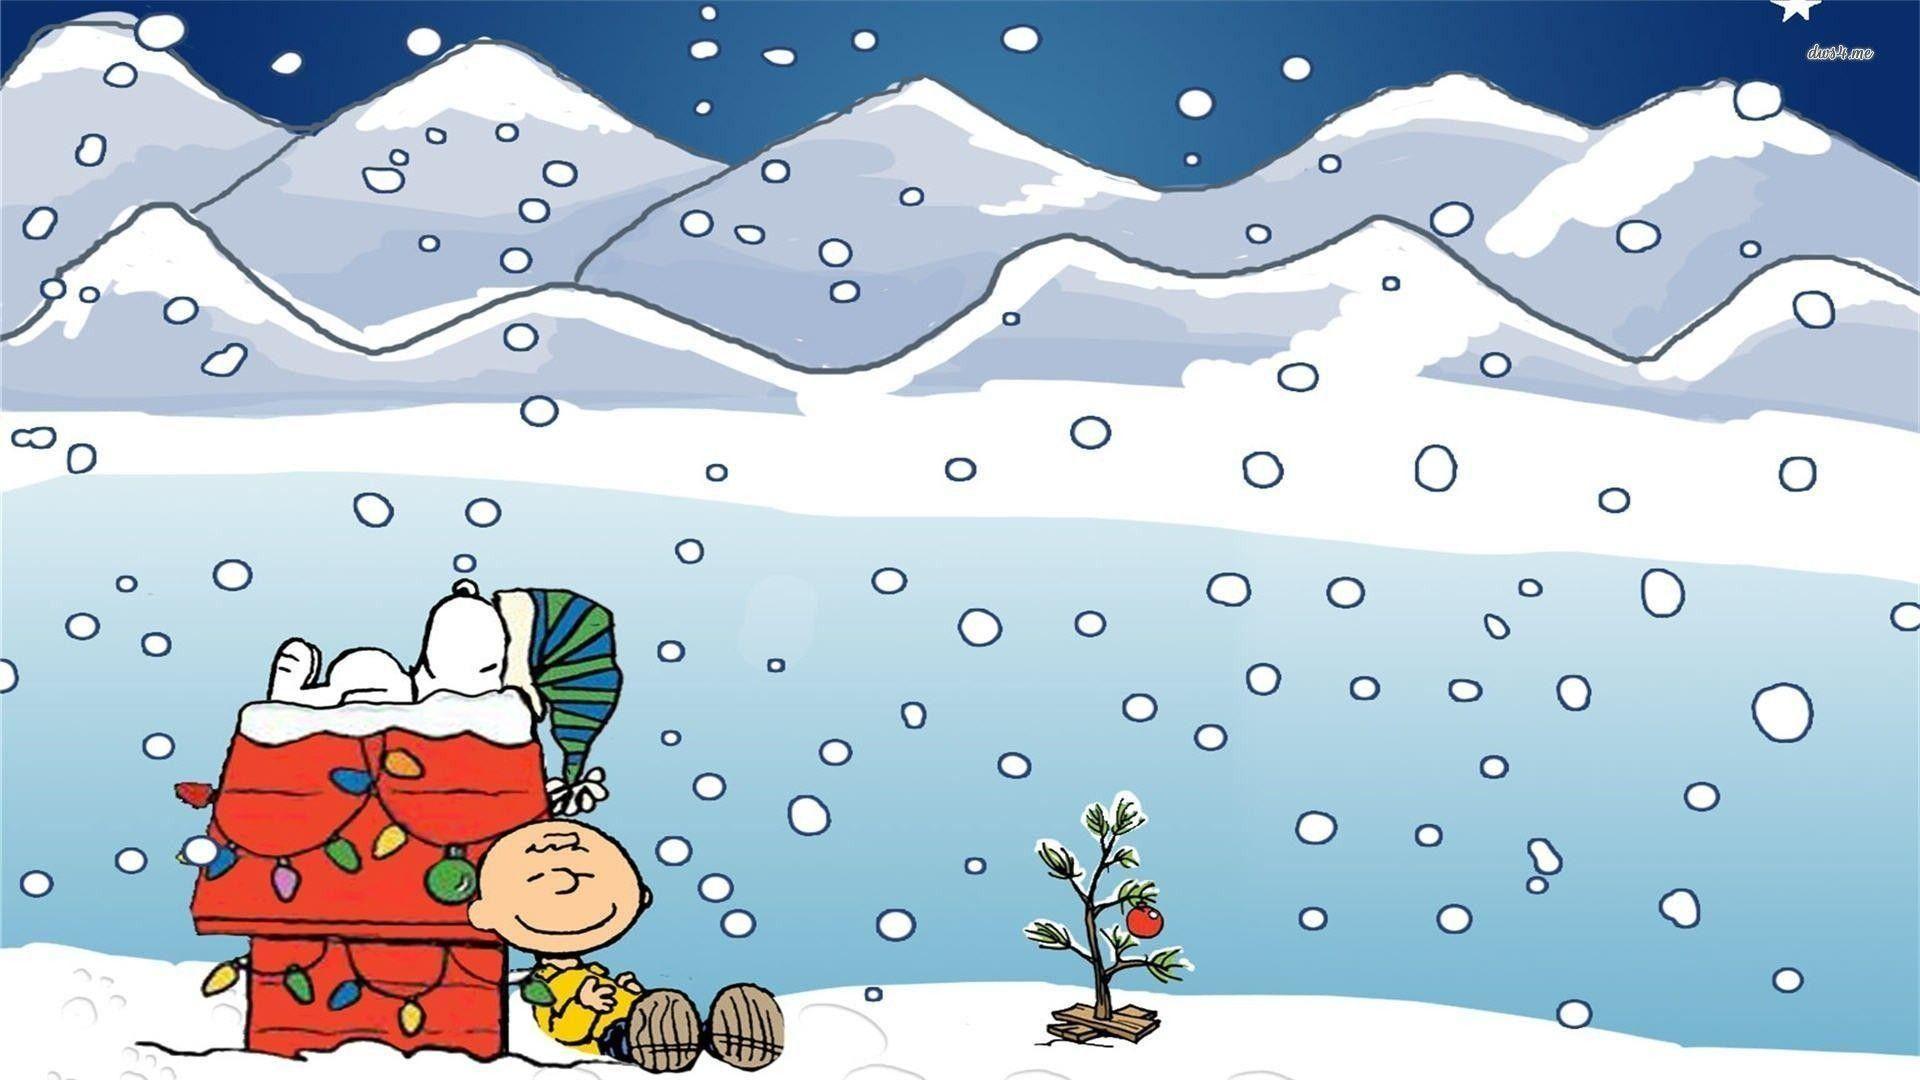 Pin by Ken Drake on Christmas Snoopy wallpaper, Cute